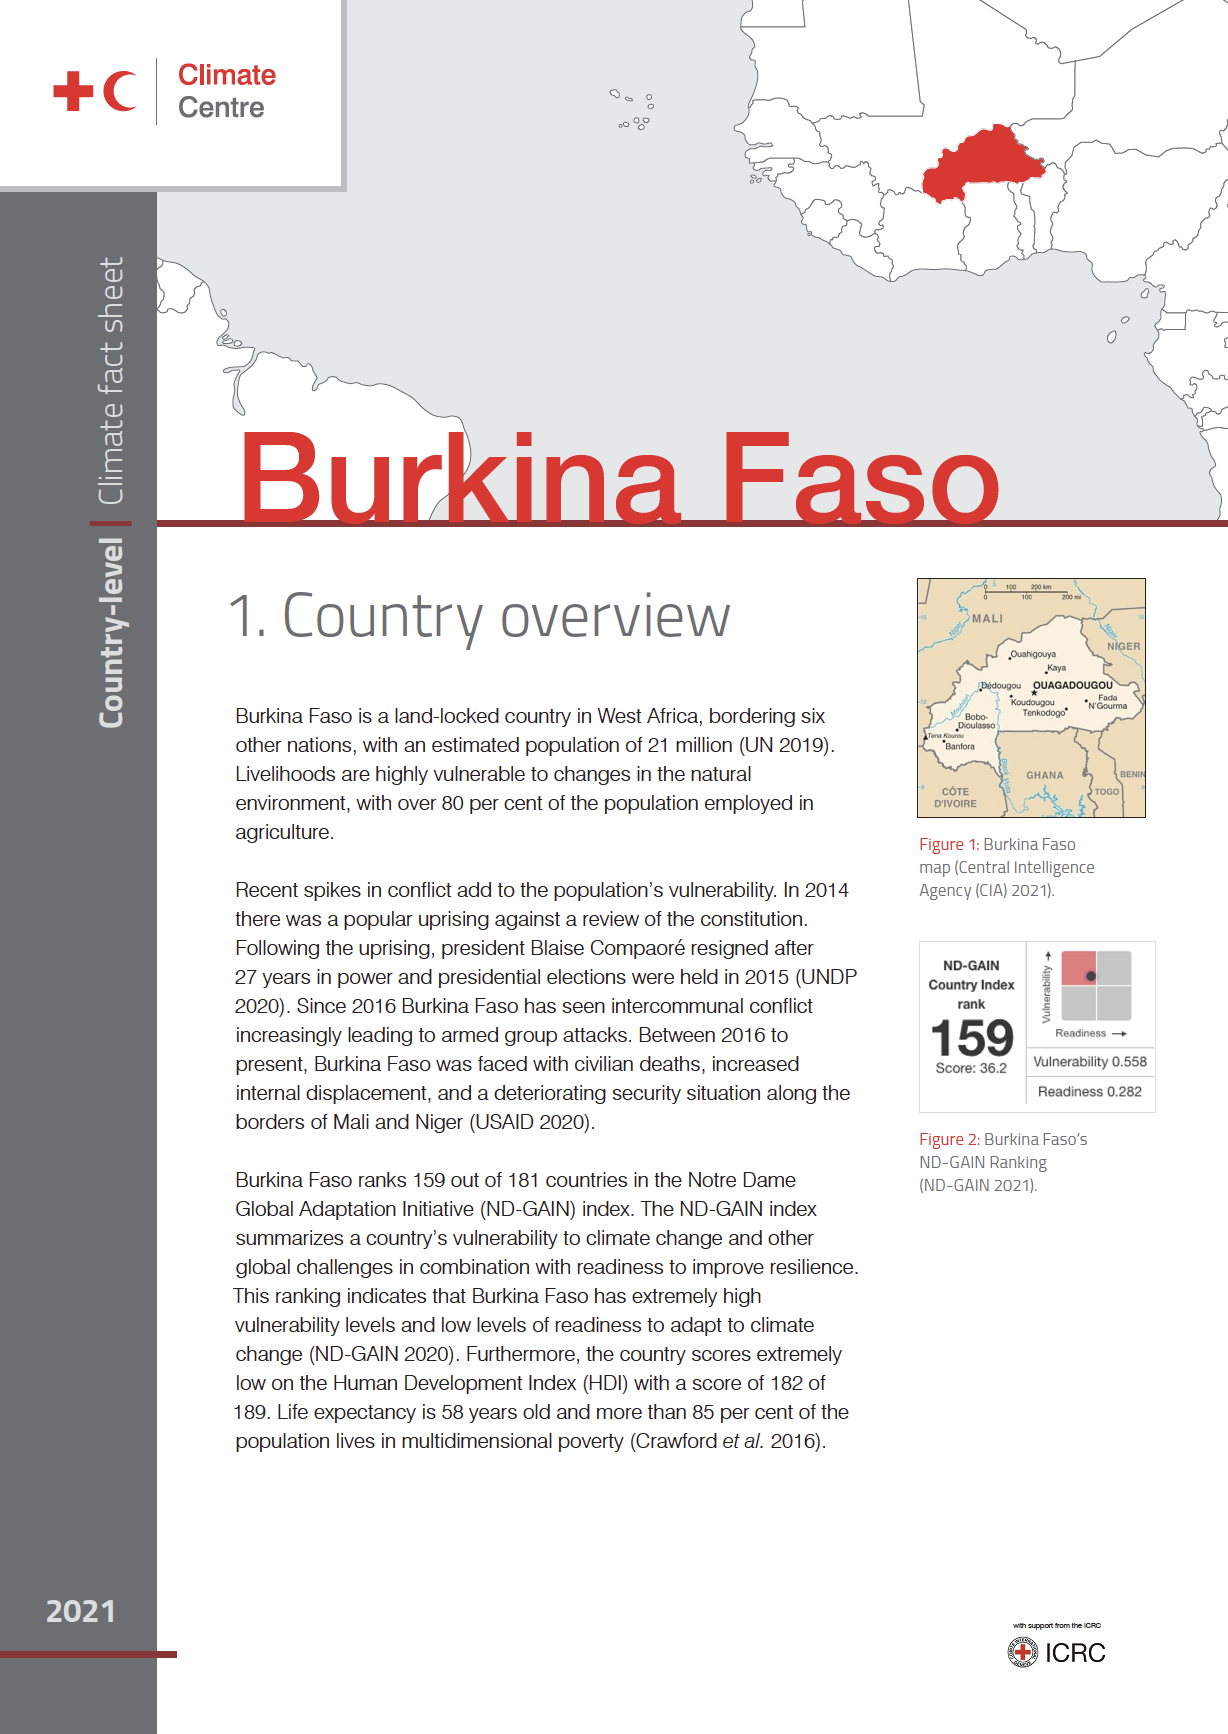 Country Factsheet: Burkina Faso